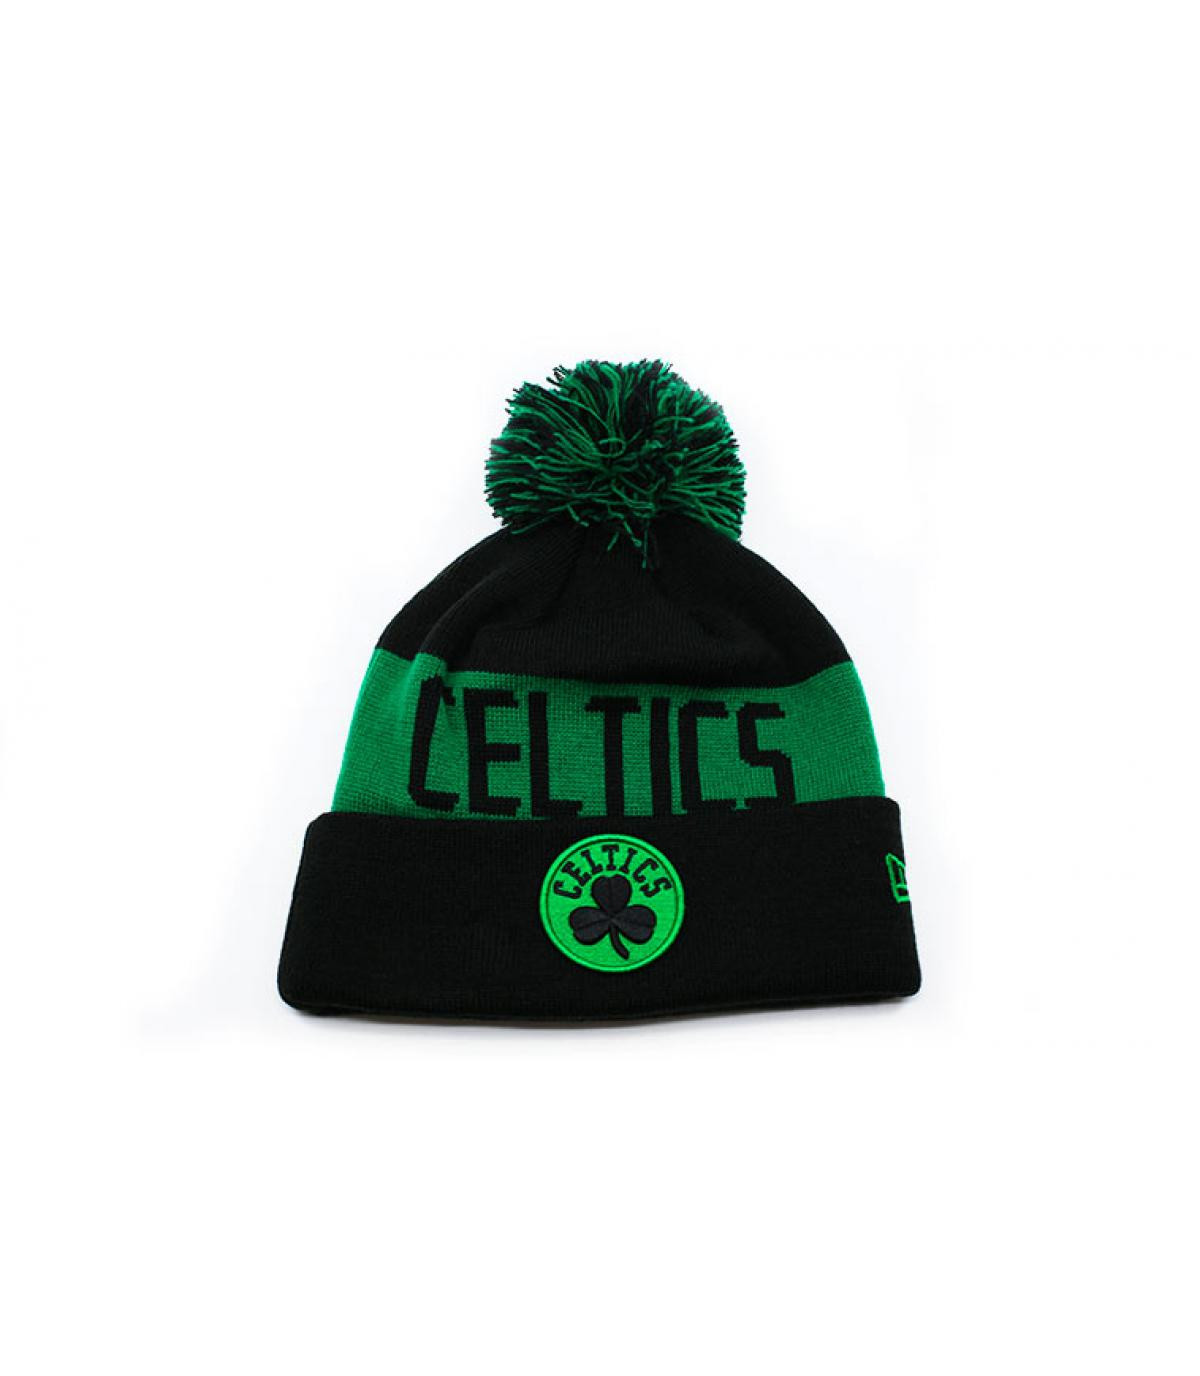 Details Team Tonal Knit Celtics - afbeeling 2